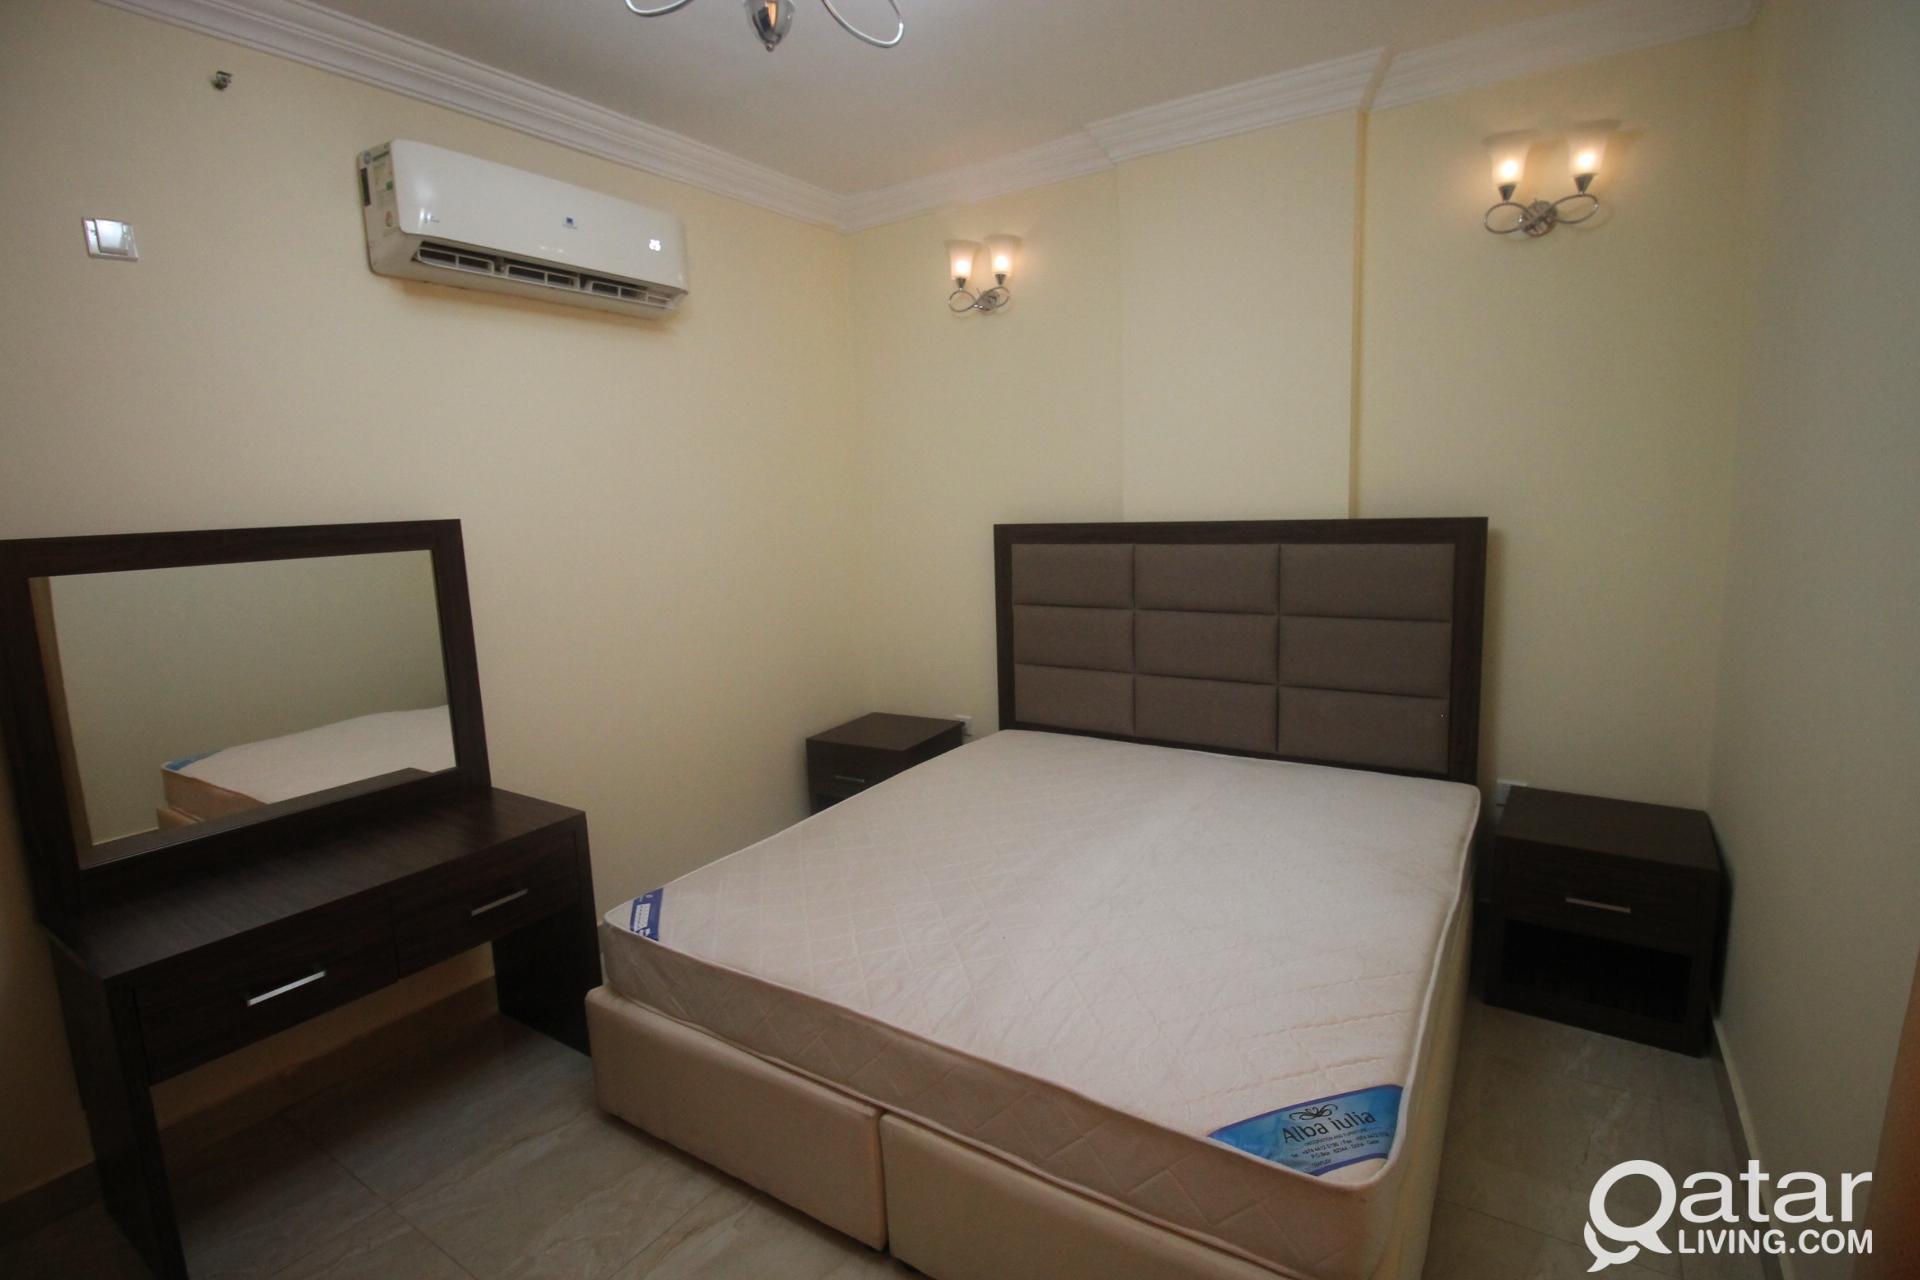 FULLY FURNISHED 1 BEDROOM APARTMENT AT MUSHERIB AR